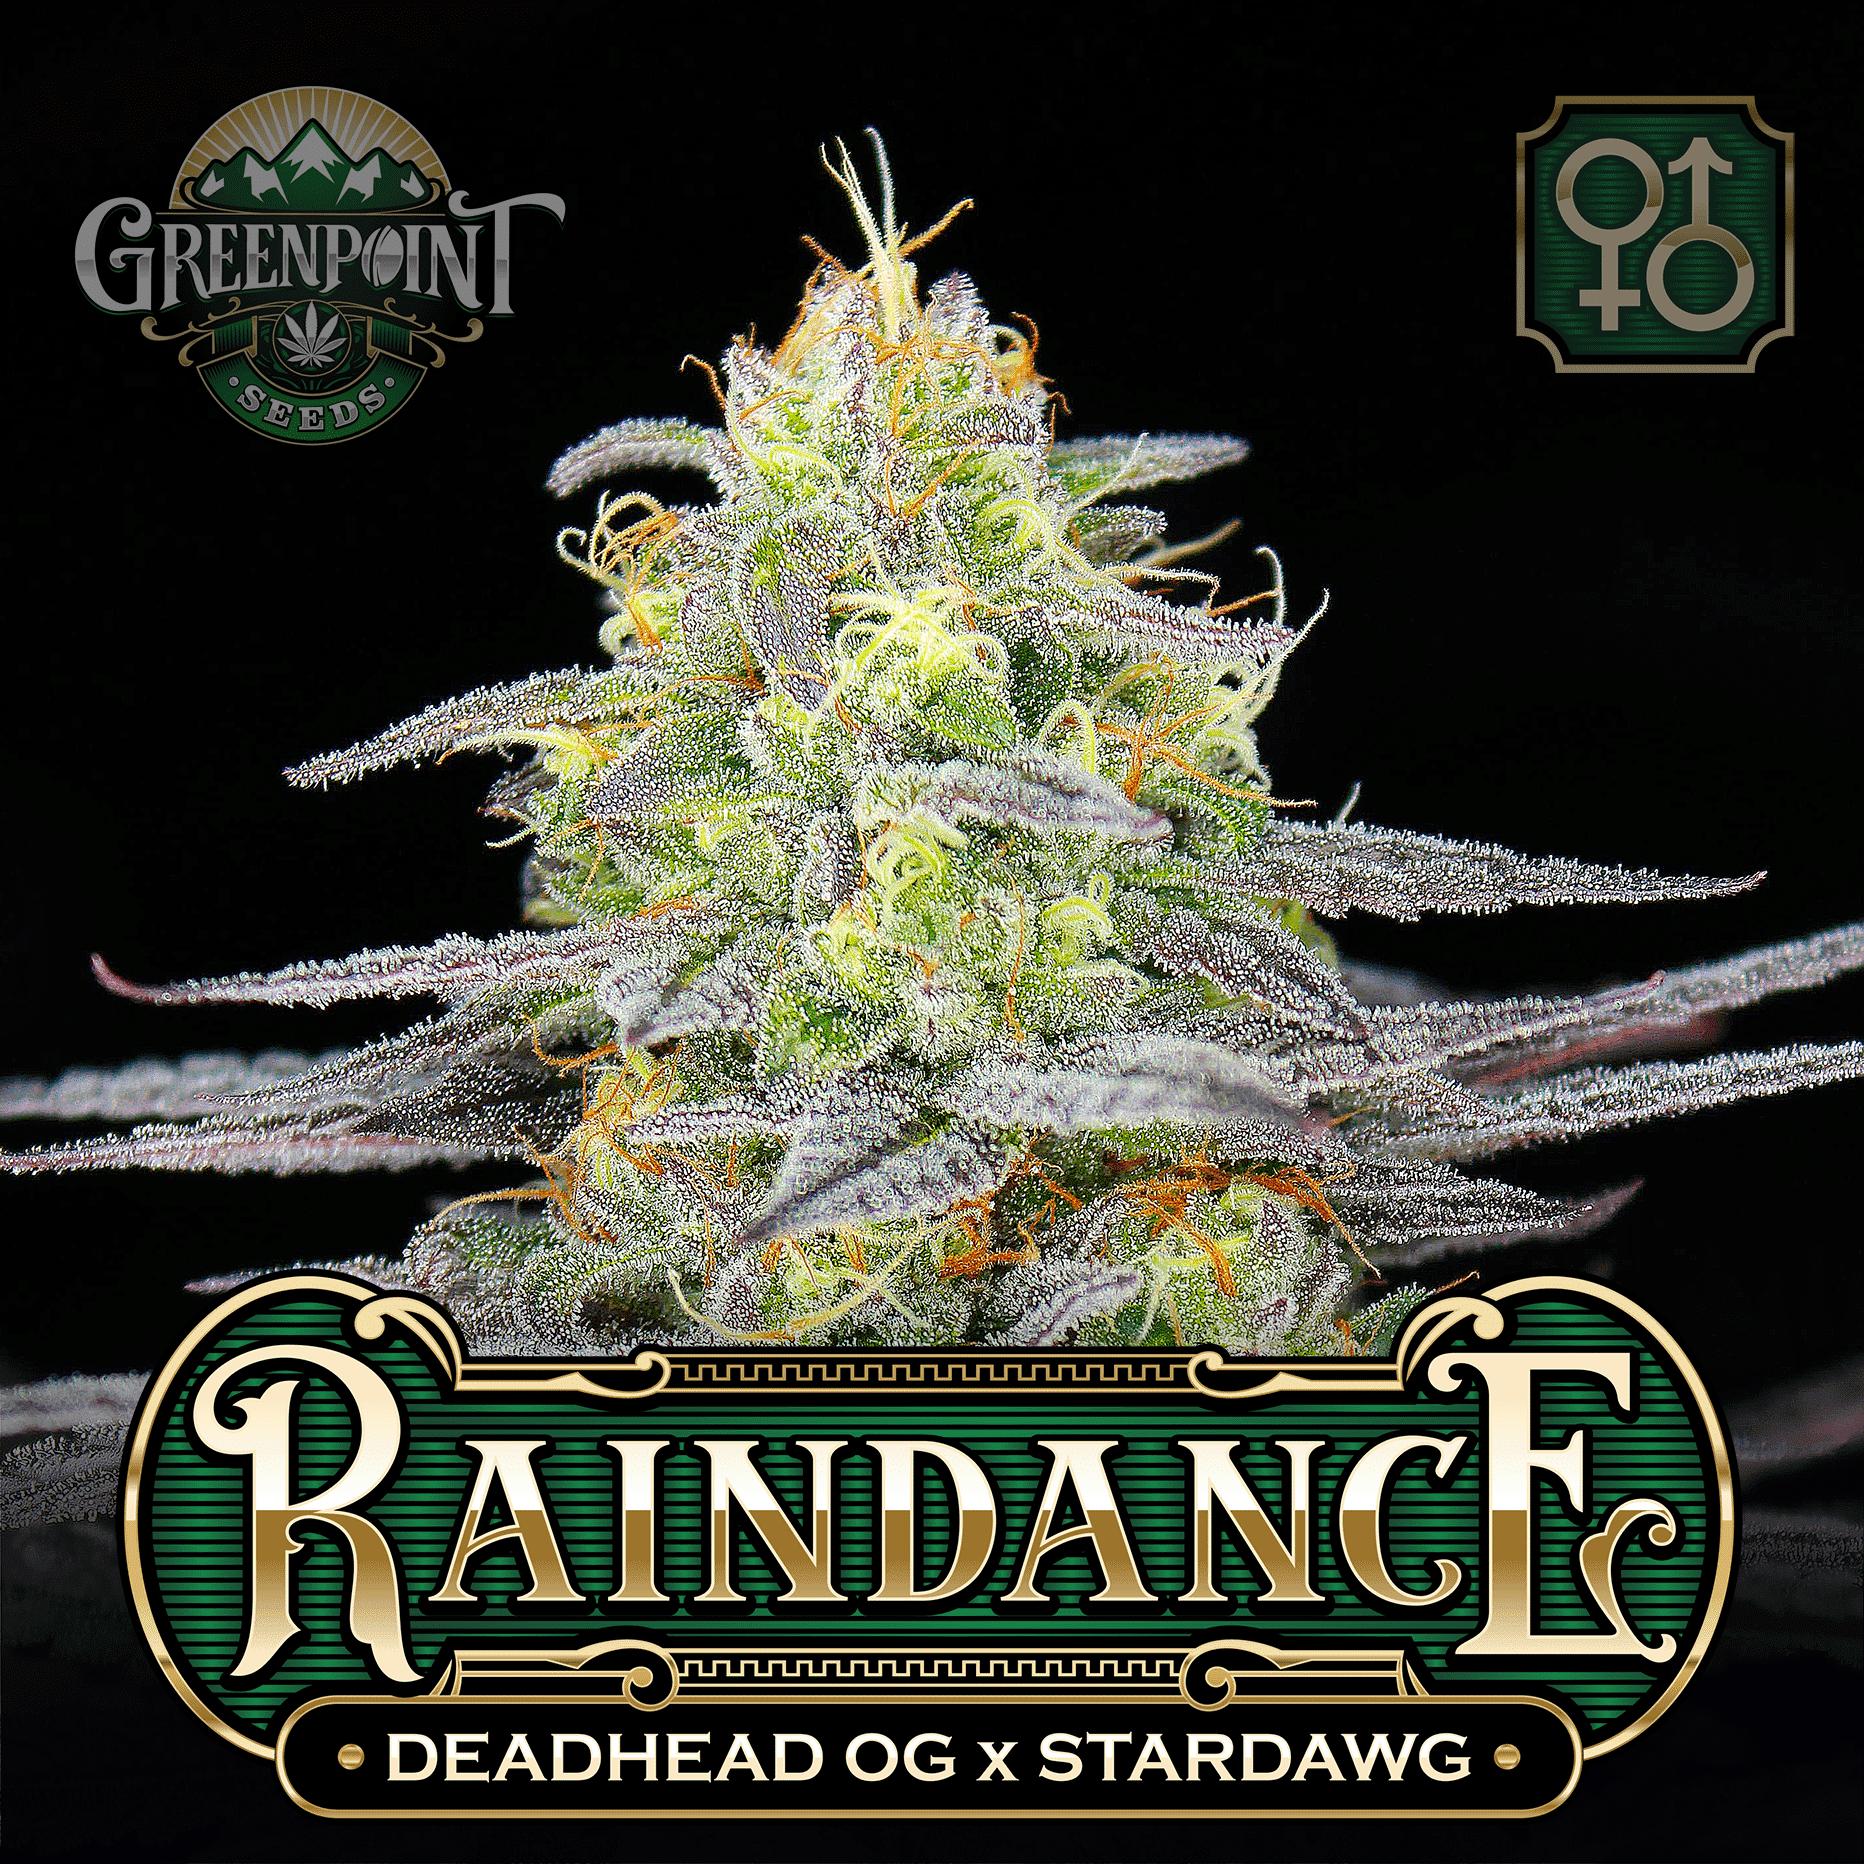 raindance-deadhead-og-stardawg-greenpoint-seeds_1a-c.png